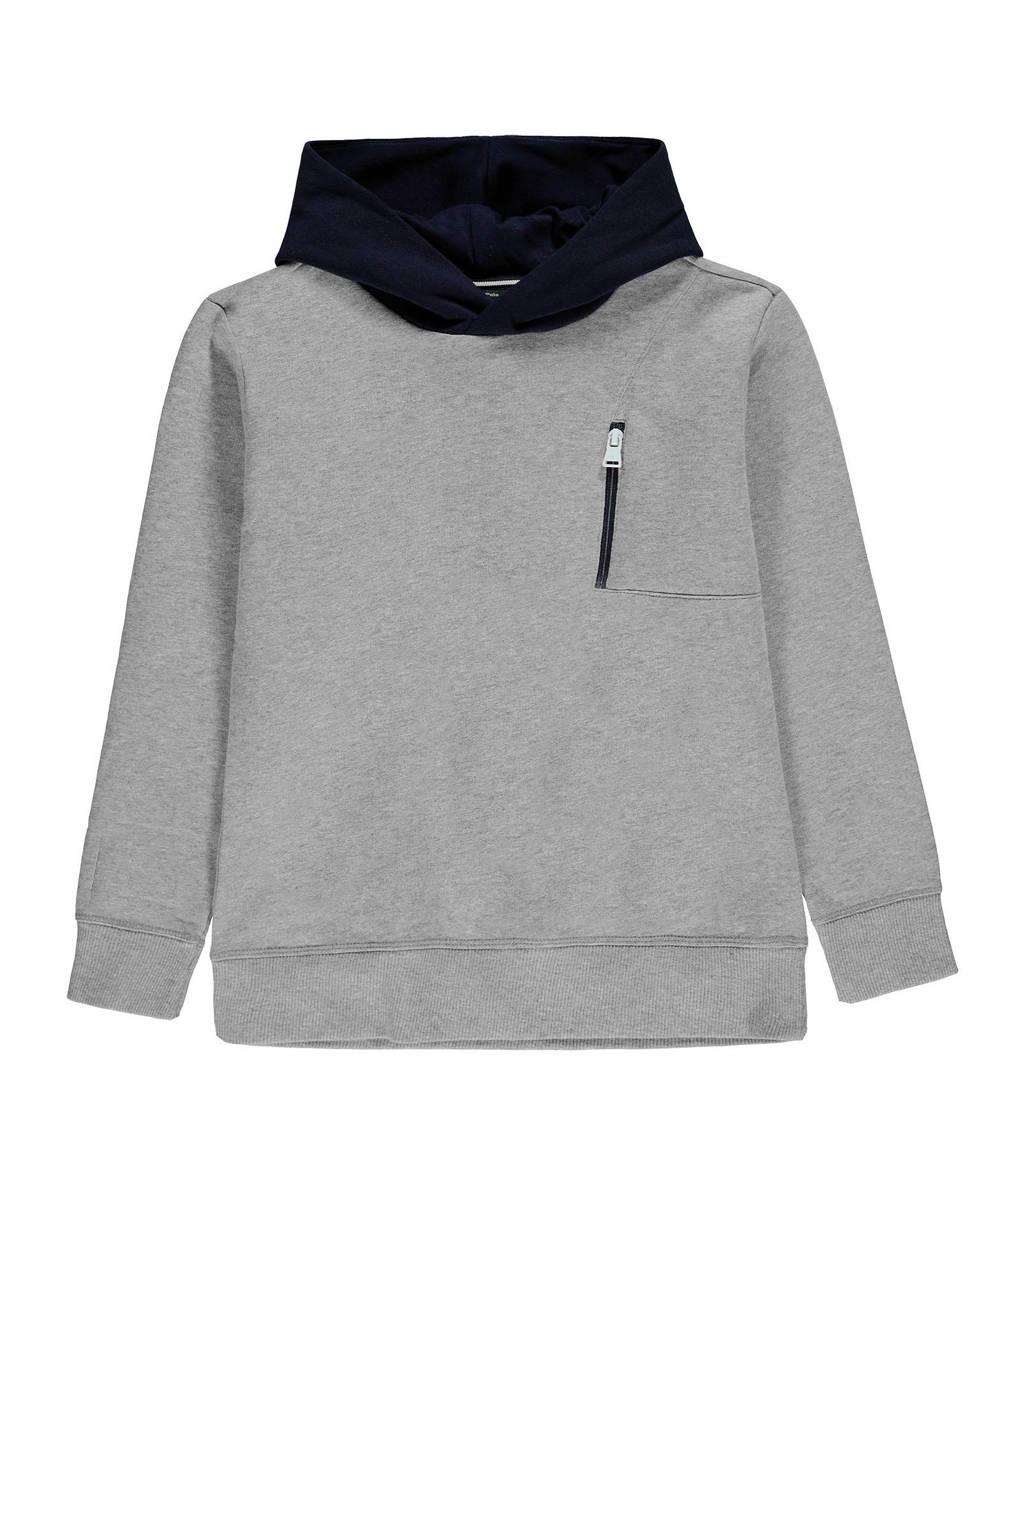 Marc O'Polo hoodie met logo grijs melange, Grijs melange